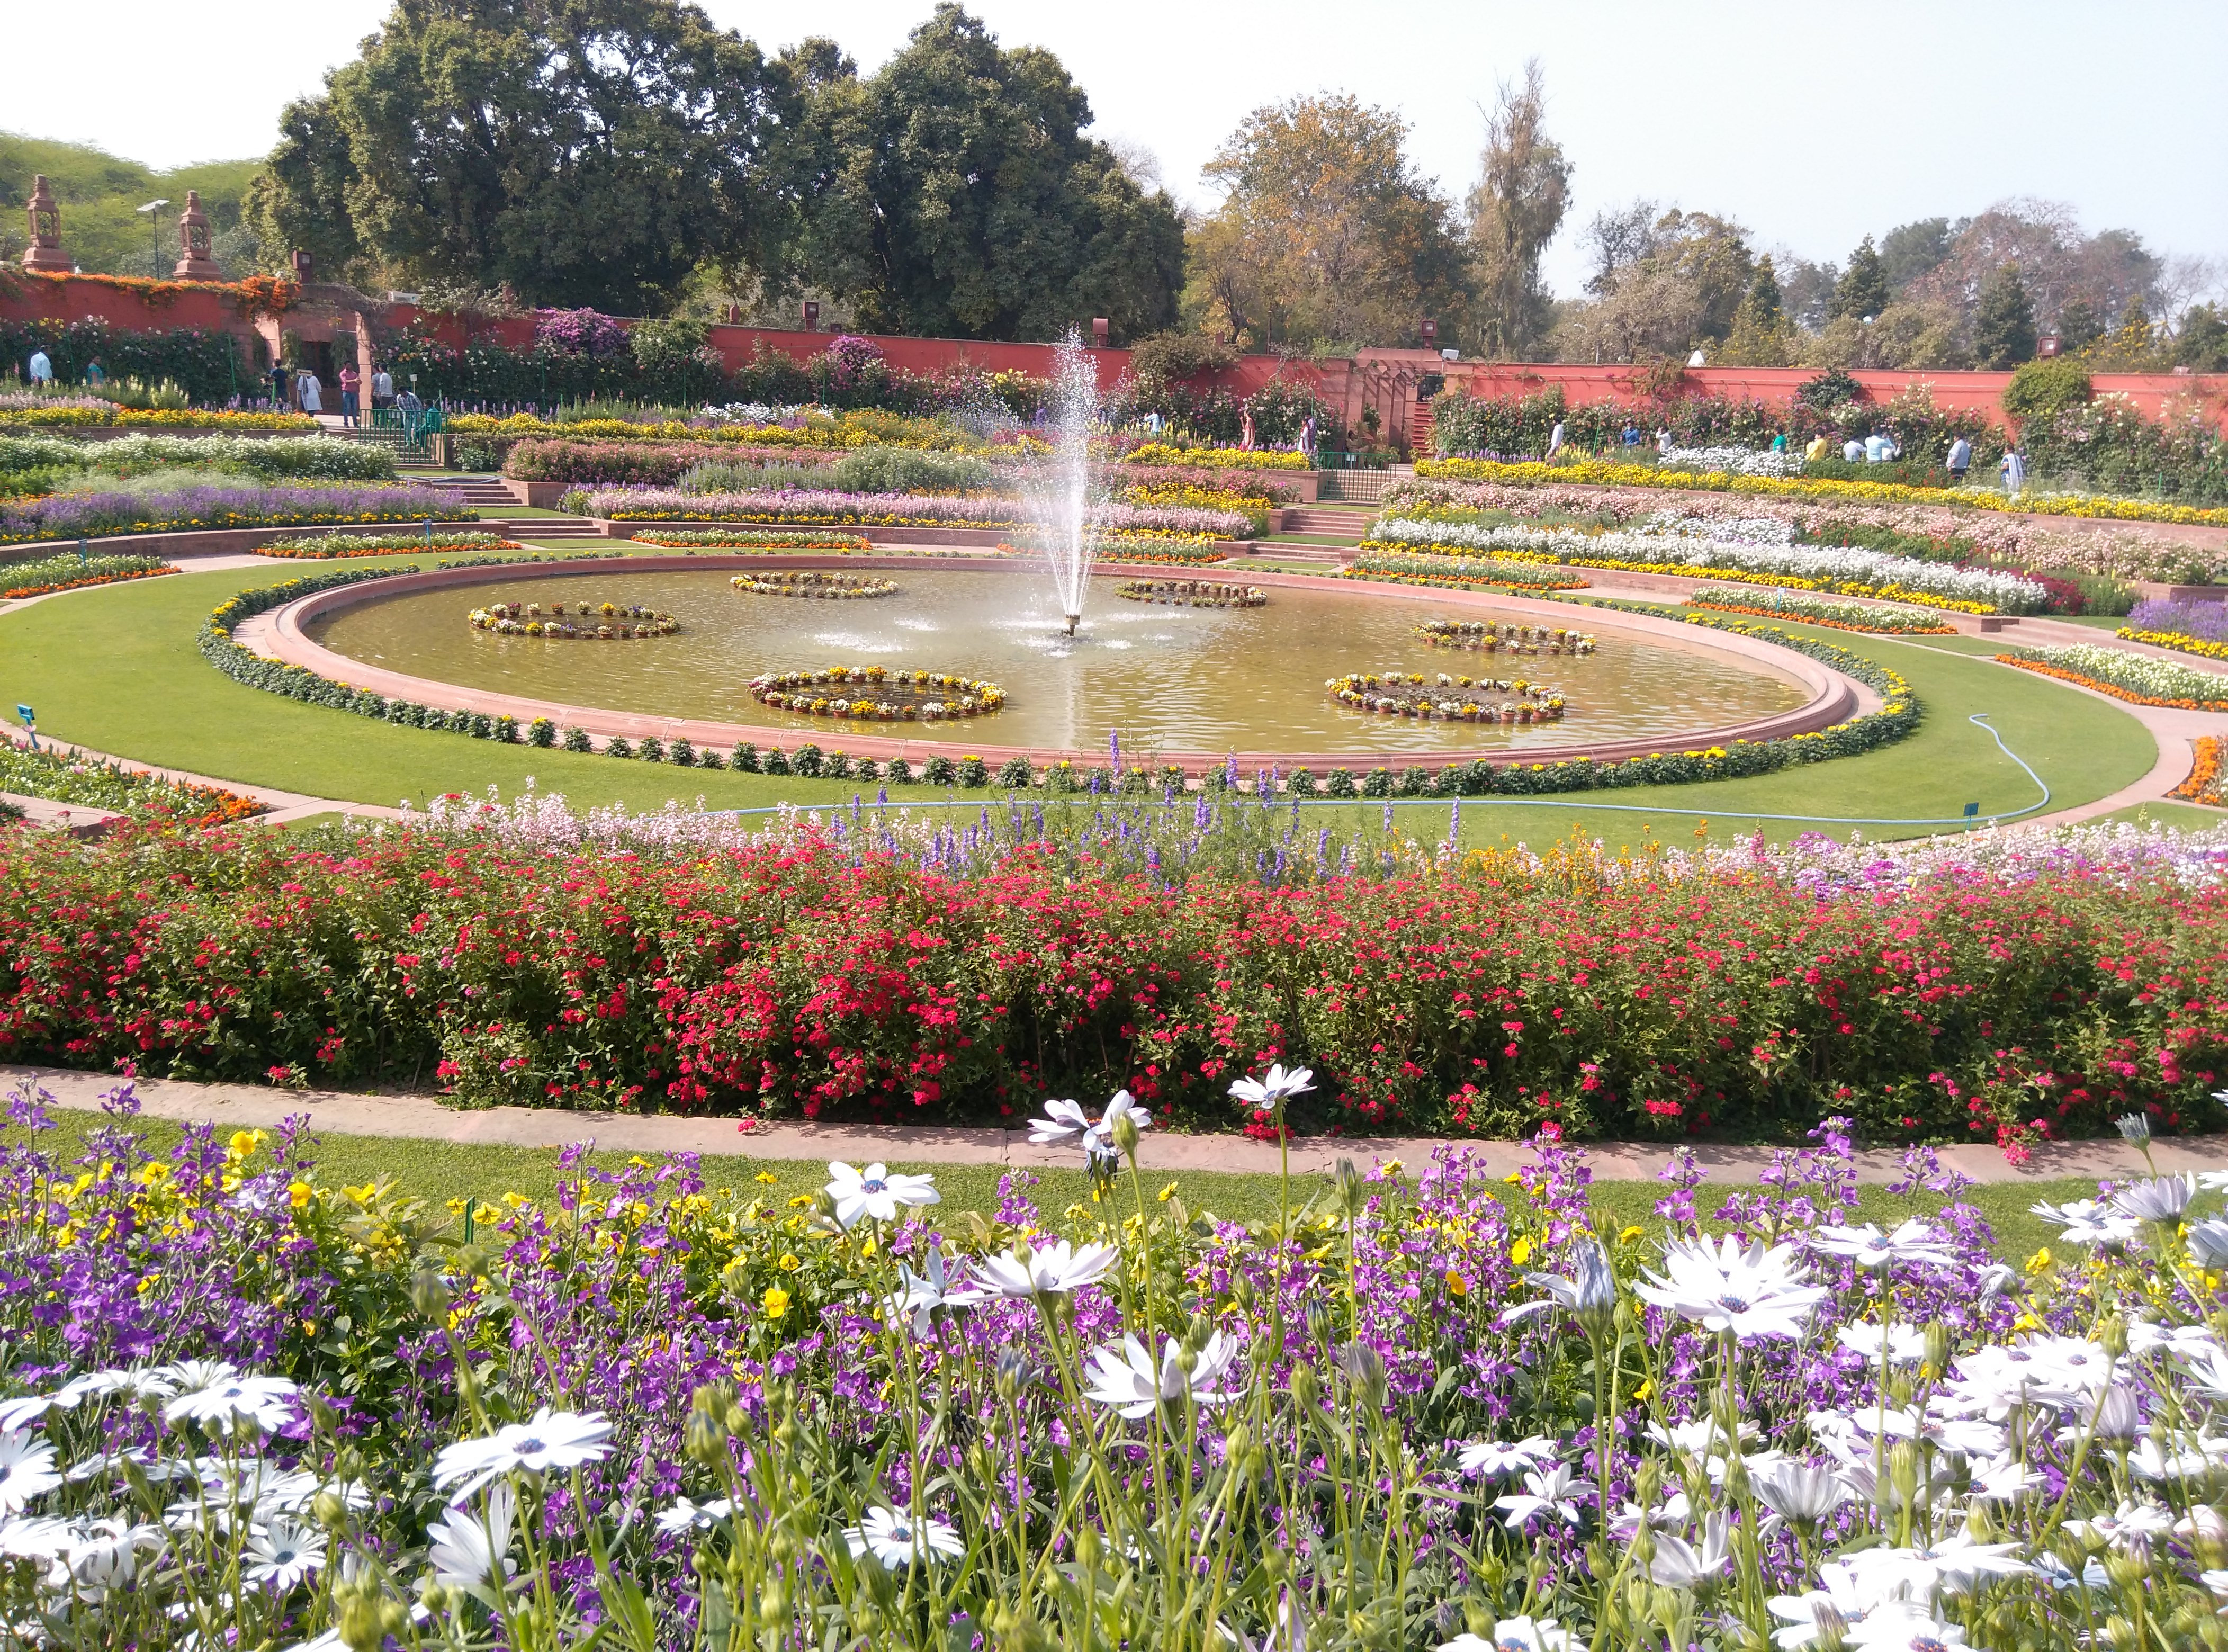 Mughal Garden in Delhi